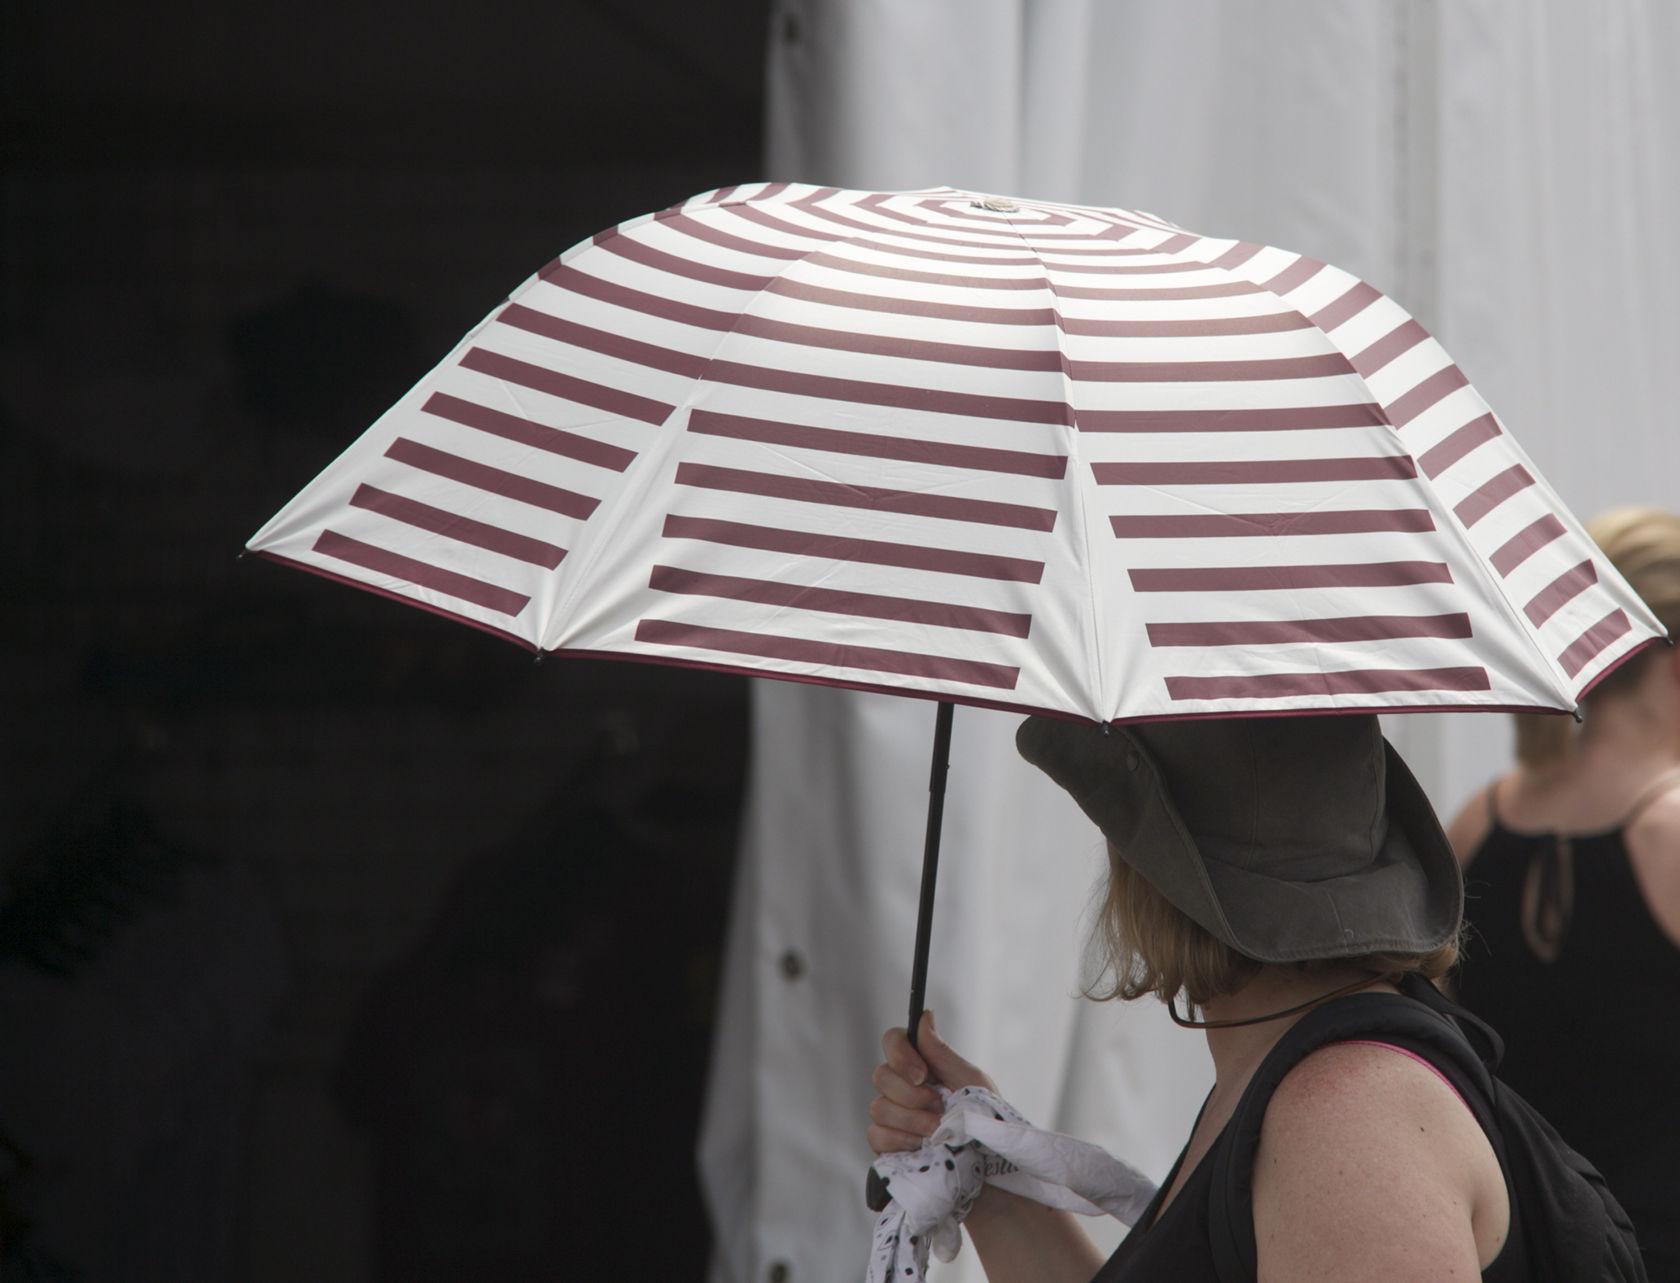 Umbrellas Jazz Fest @JazzJest #JazzFest #NOLA #NewOrleans